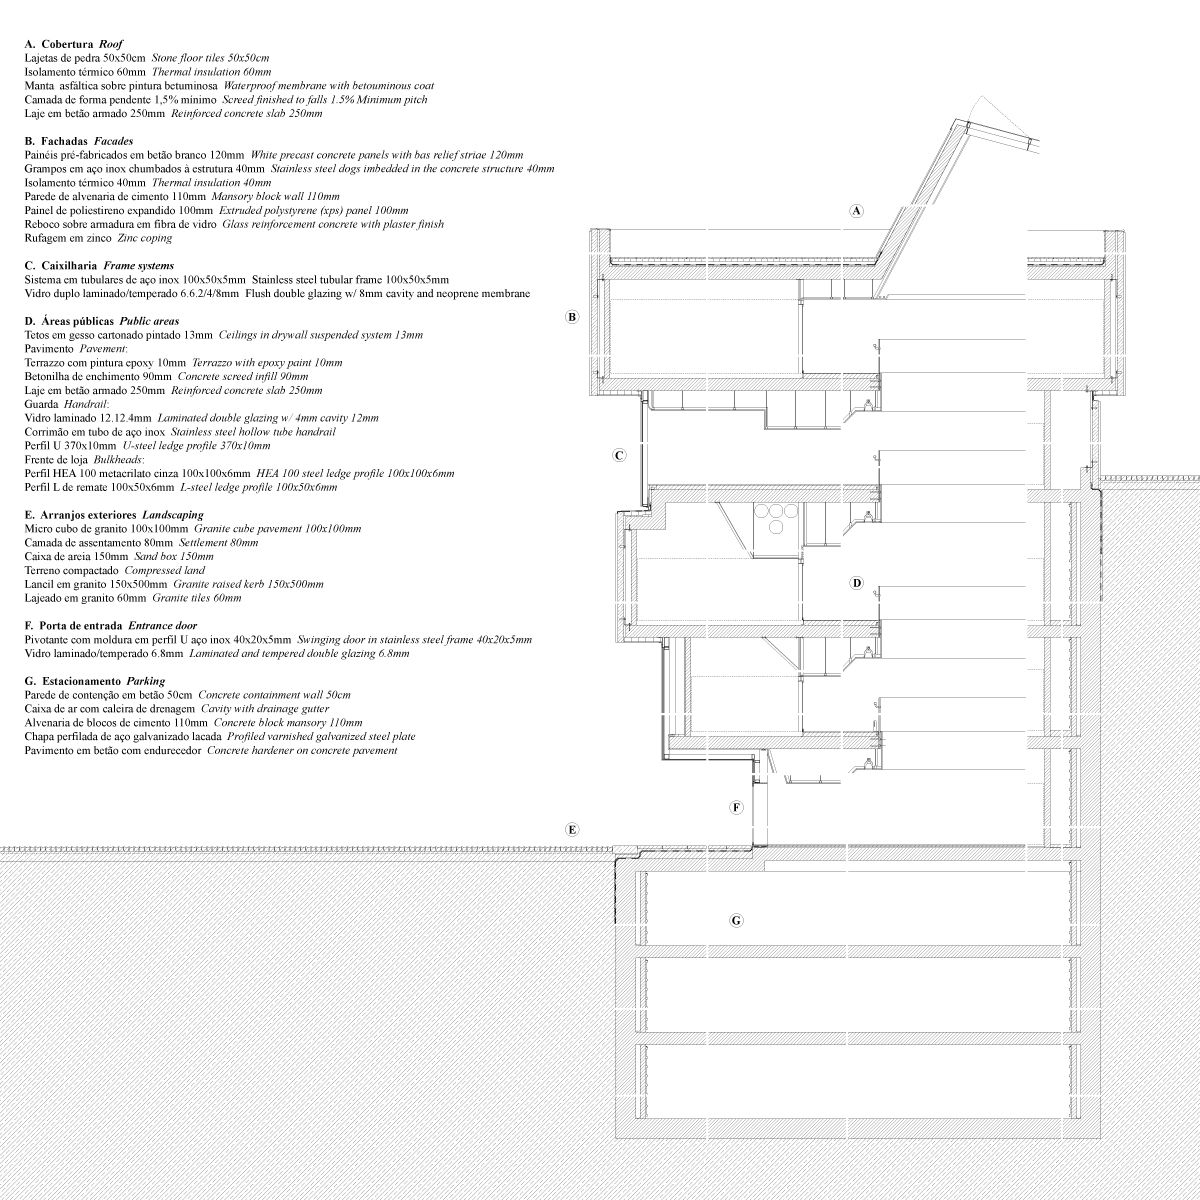 Promontorio Vivaci Guarda Architecture Sketch Shopping Mall How To Plan